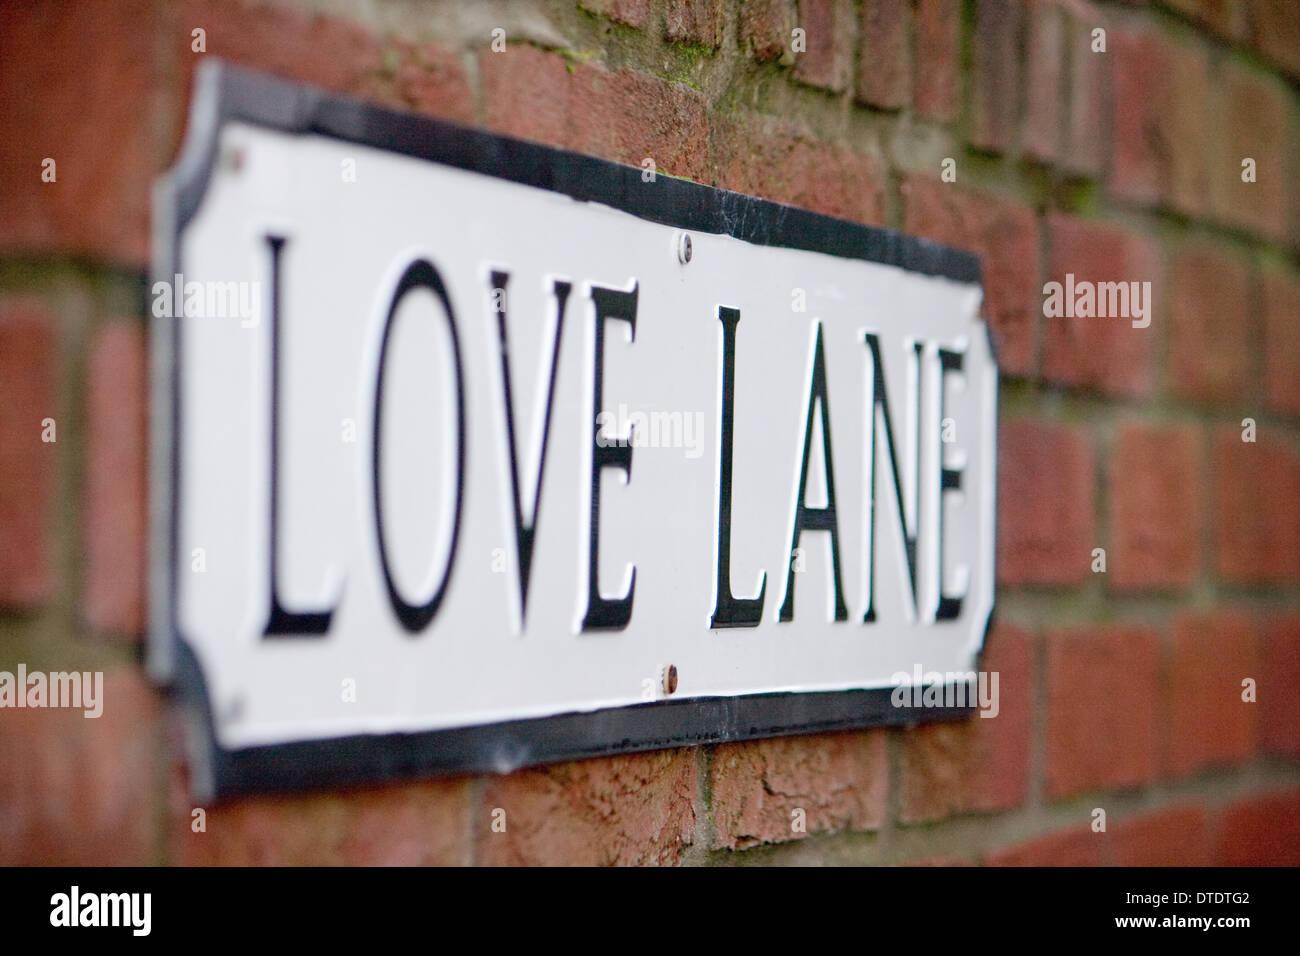 Love lane street name in Weymouth,Dorset. - Stock Image